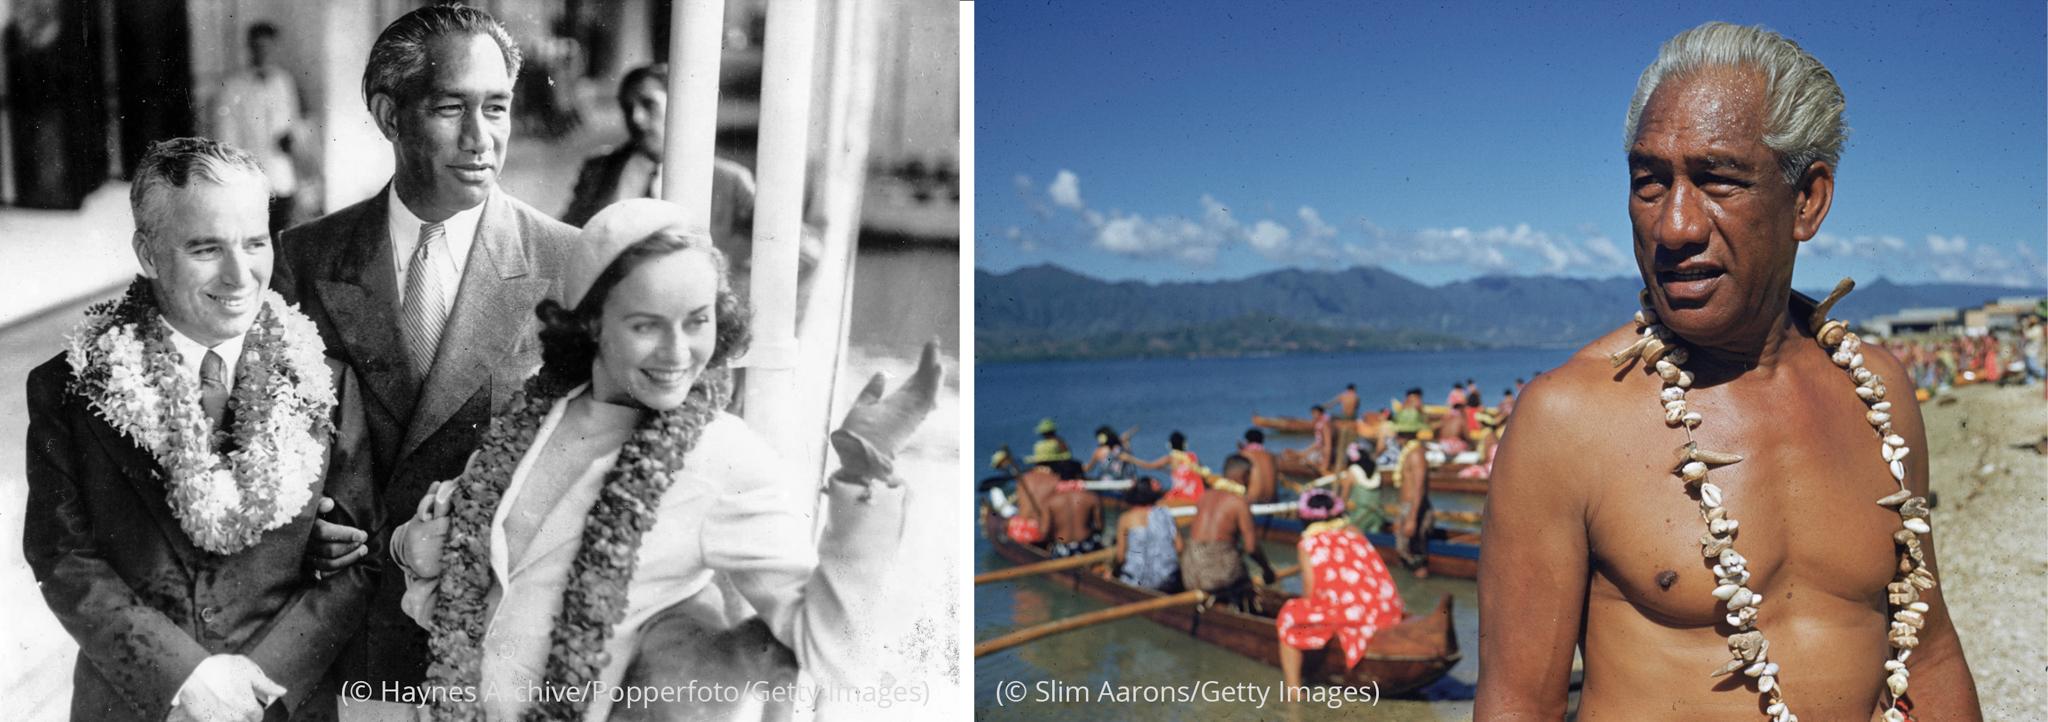 "Izda.: Duke Kahanamoku de pie detrás de Charlie Chaplin y Paulette Goddard (© Haynes Archive/Popperfoto/Getty Images) Dcha.: Duke Kahanamoku de pie frente a personas en canoas ""outrigger"" (© Slim Aarons/Getty Images)"